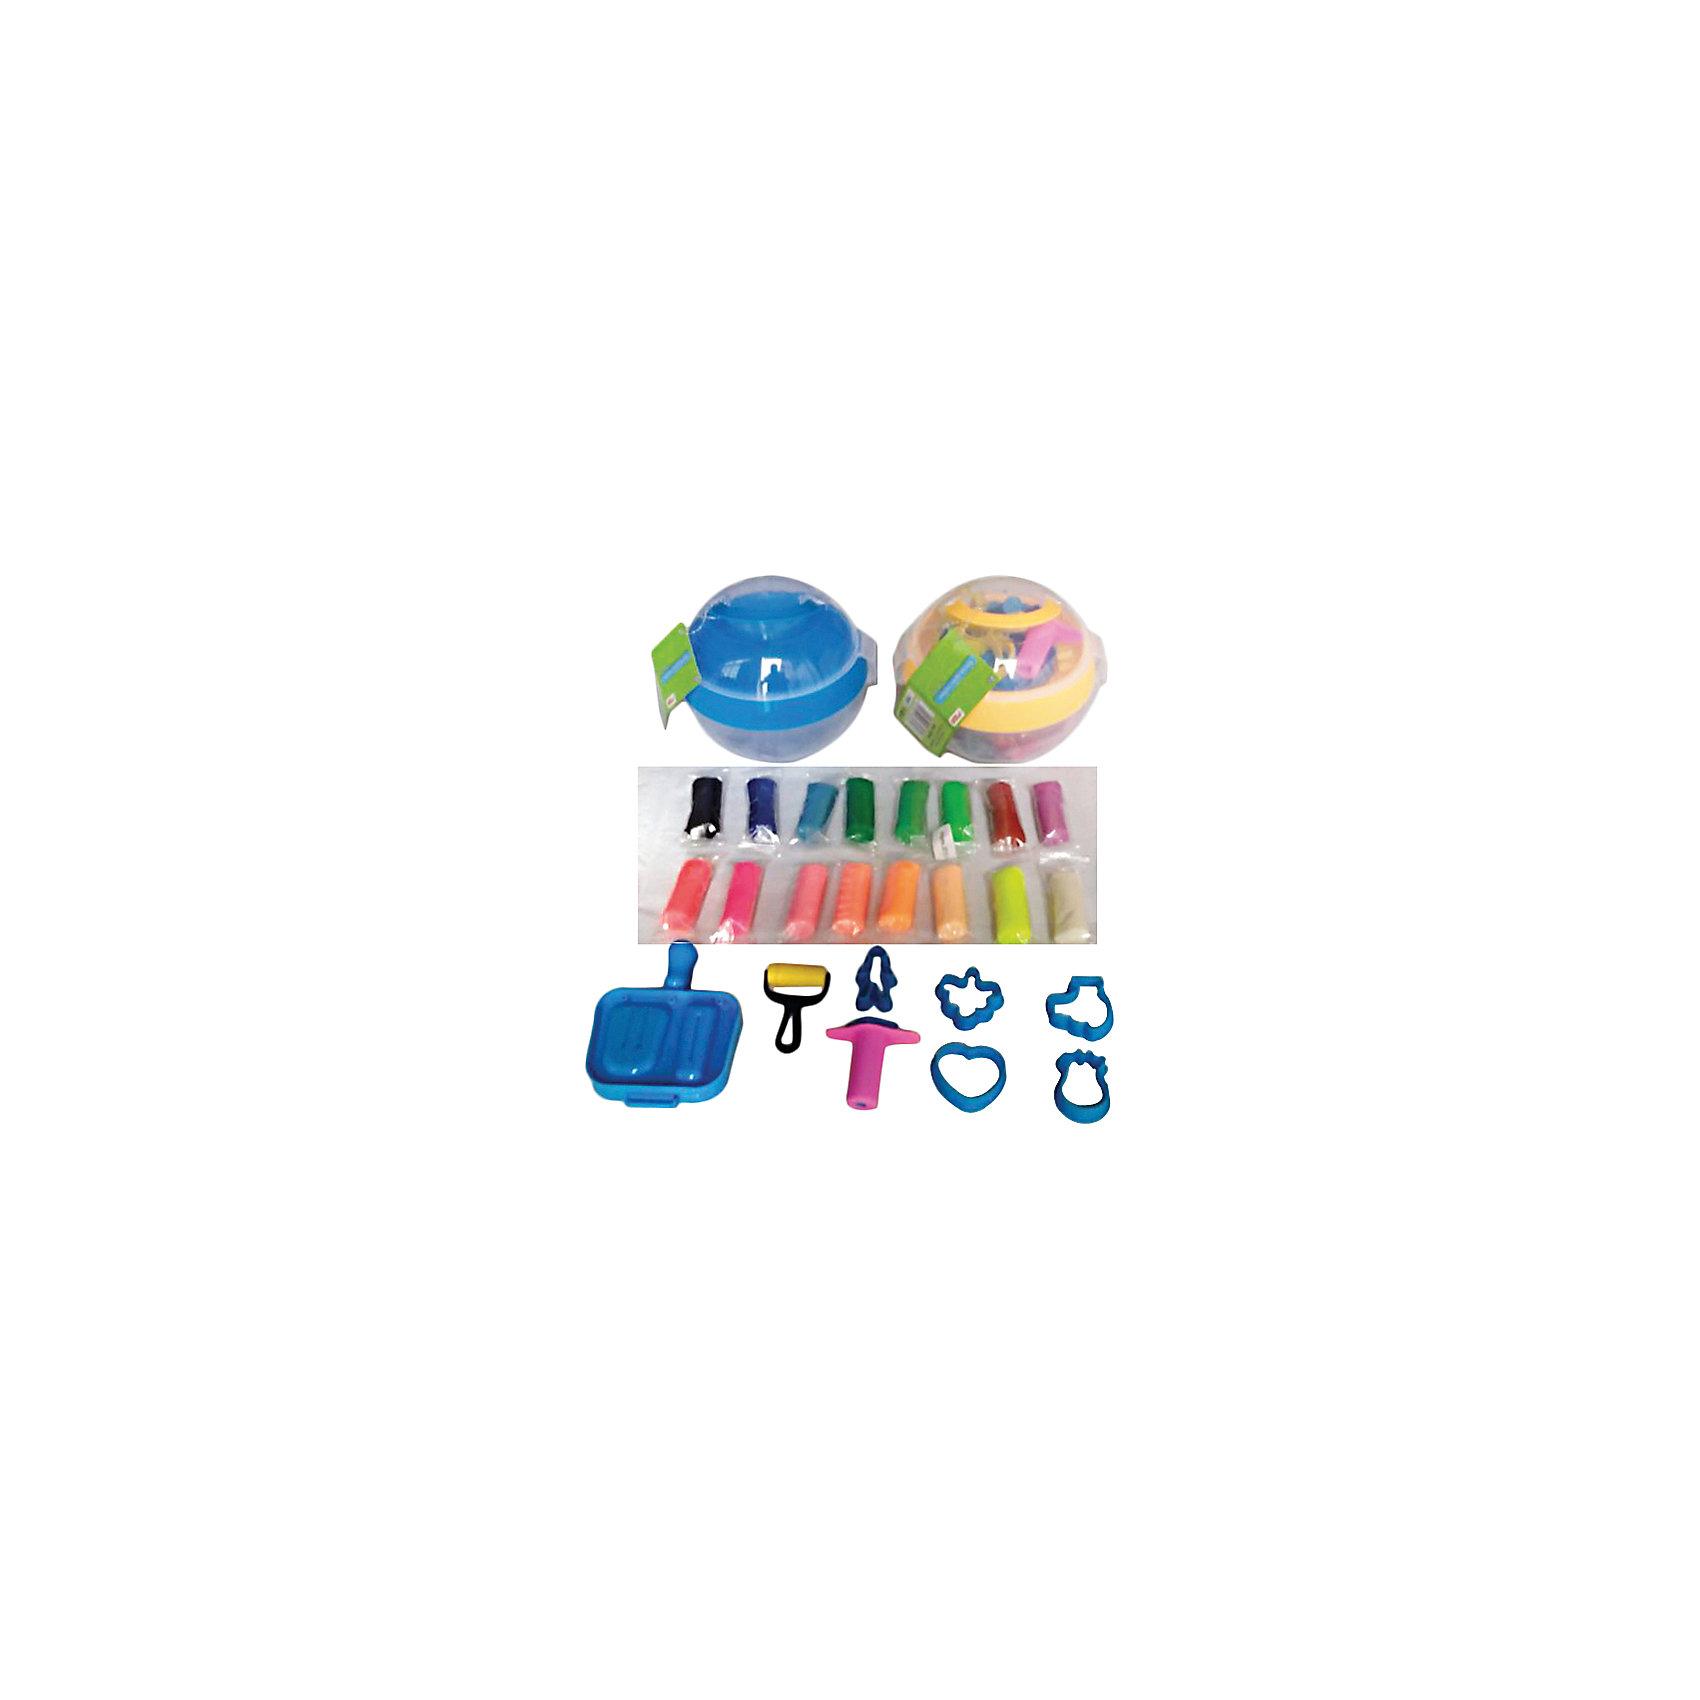 Тесто для лепки: 16 цветов, 272 г, формочки Color Puppy